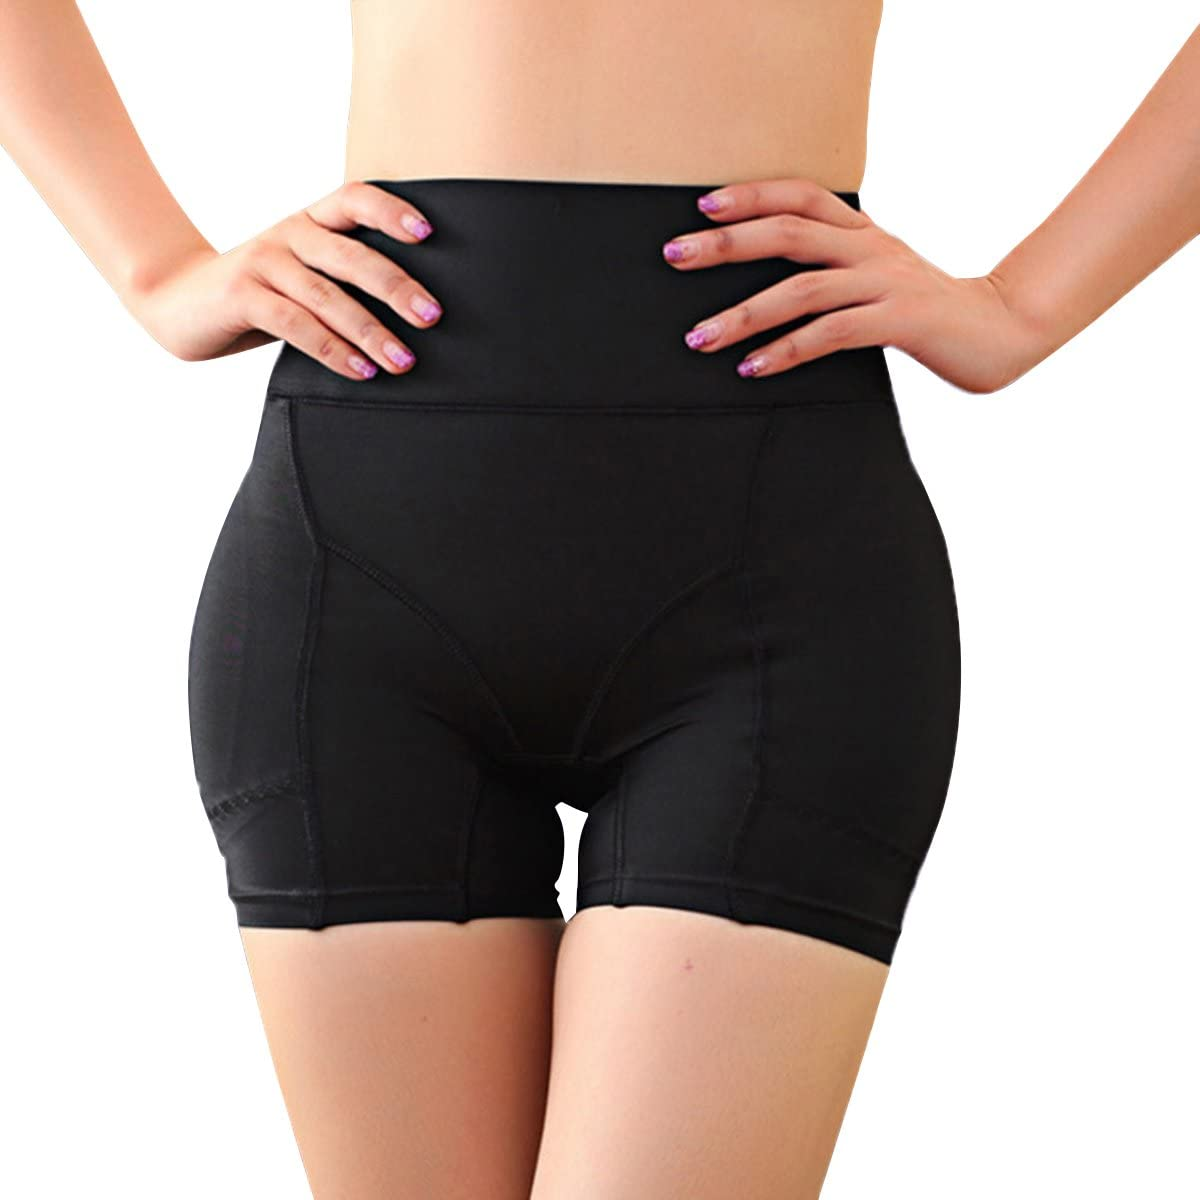 Miureal Women's Hip Enhancer Firm Control Seamless Padded Thigh Slimmer Panties